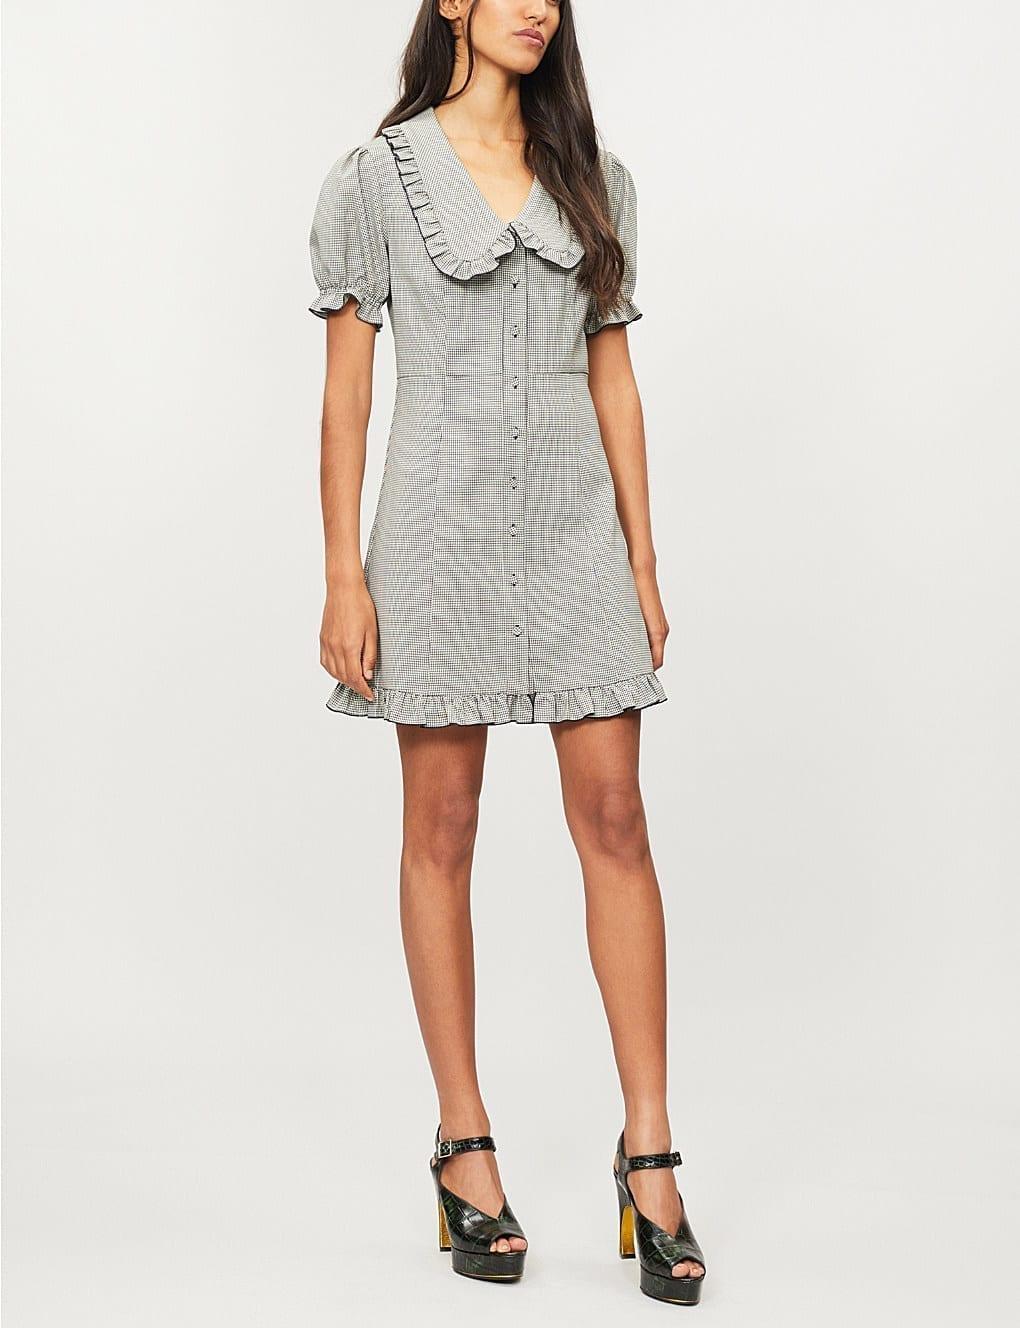 ALEXACHUNG Babydoll Wool Blend Mini Black / White Dress